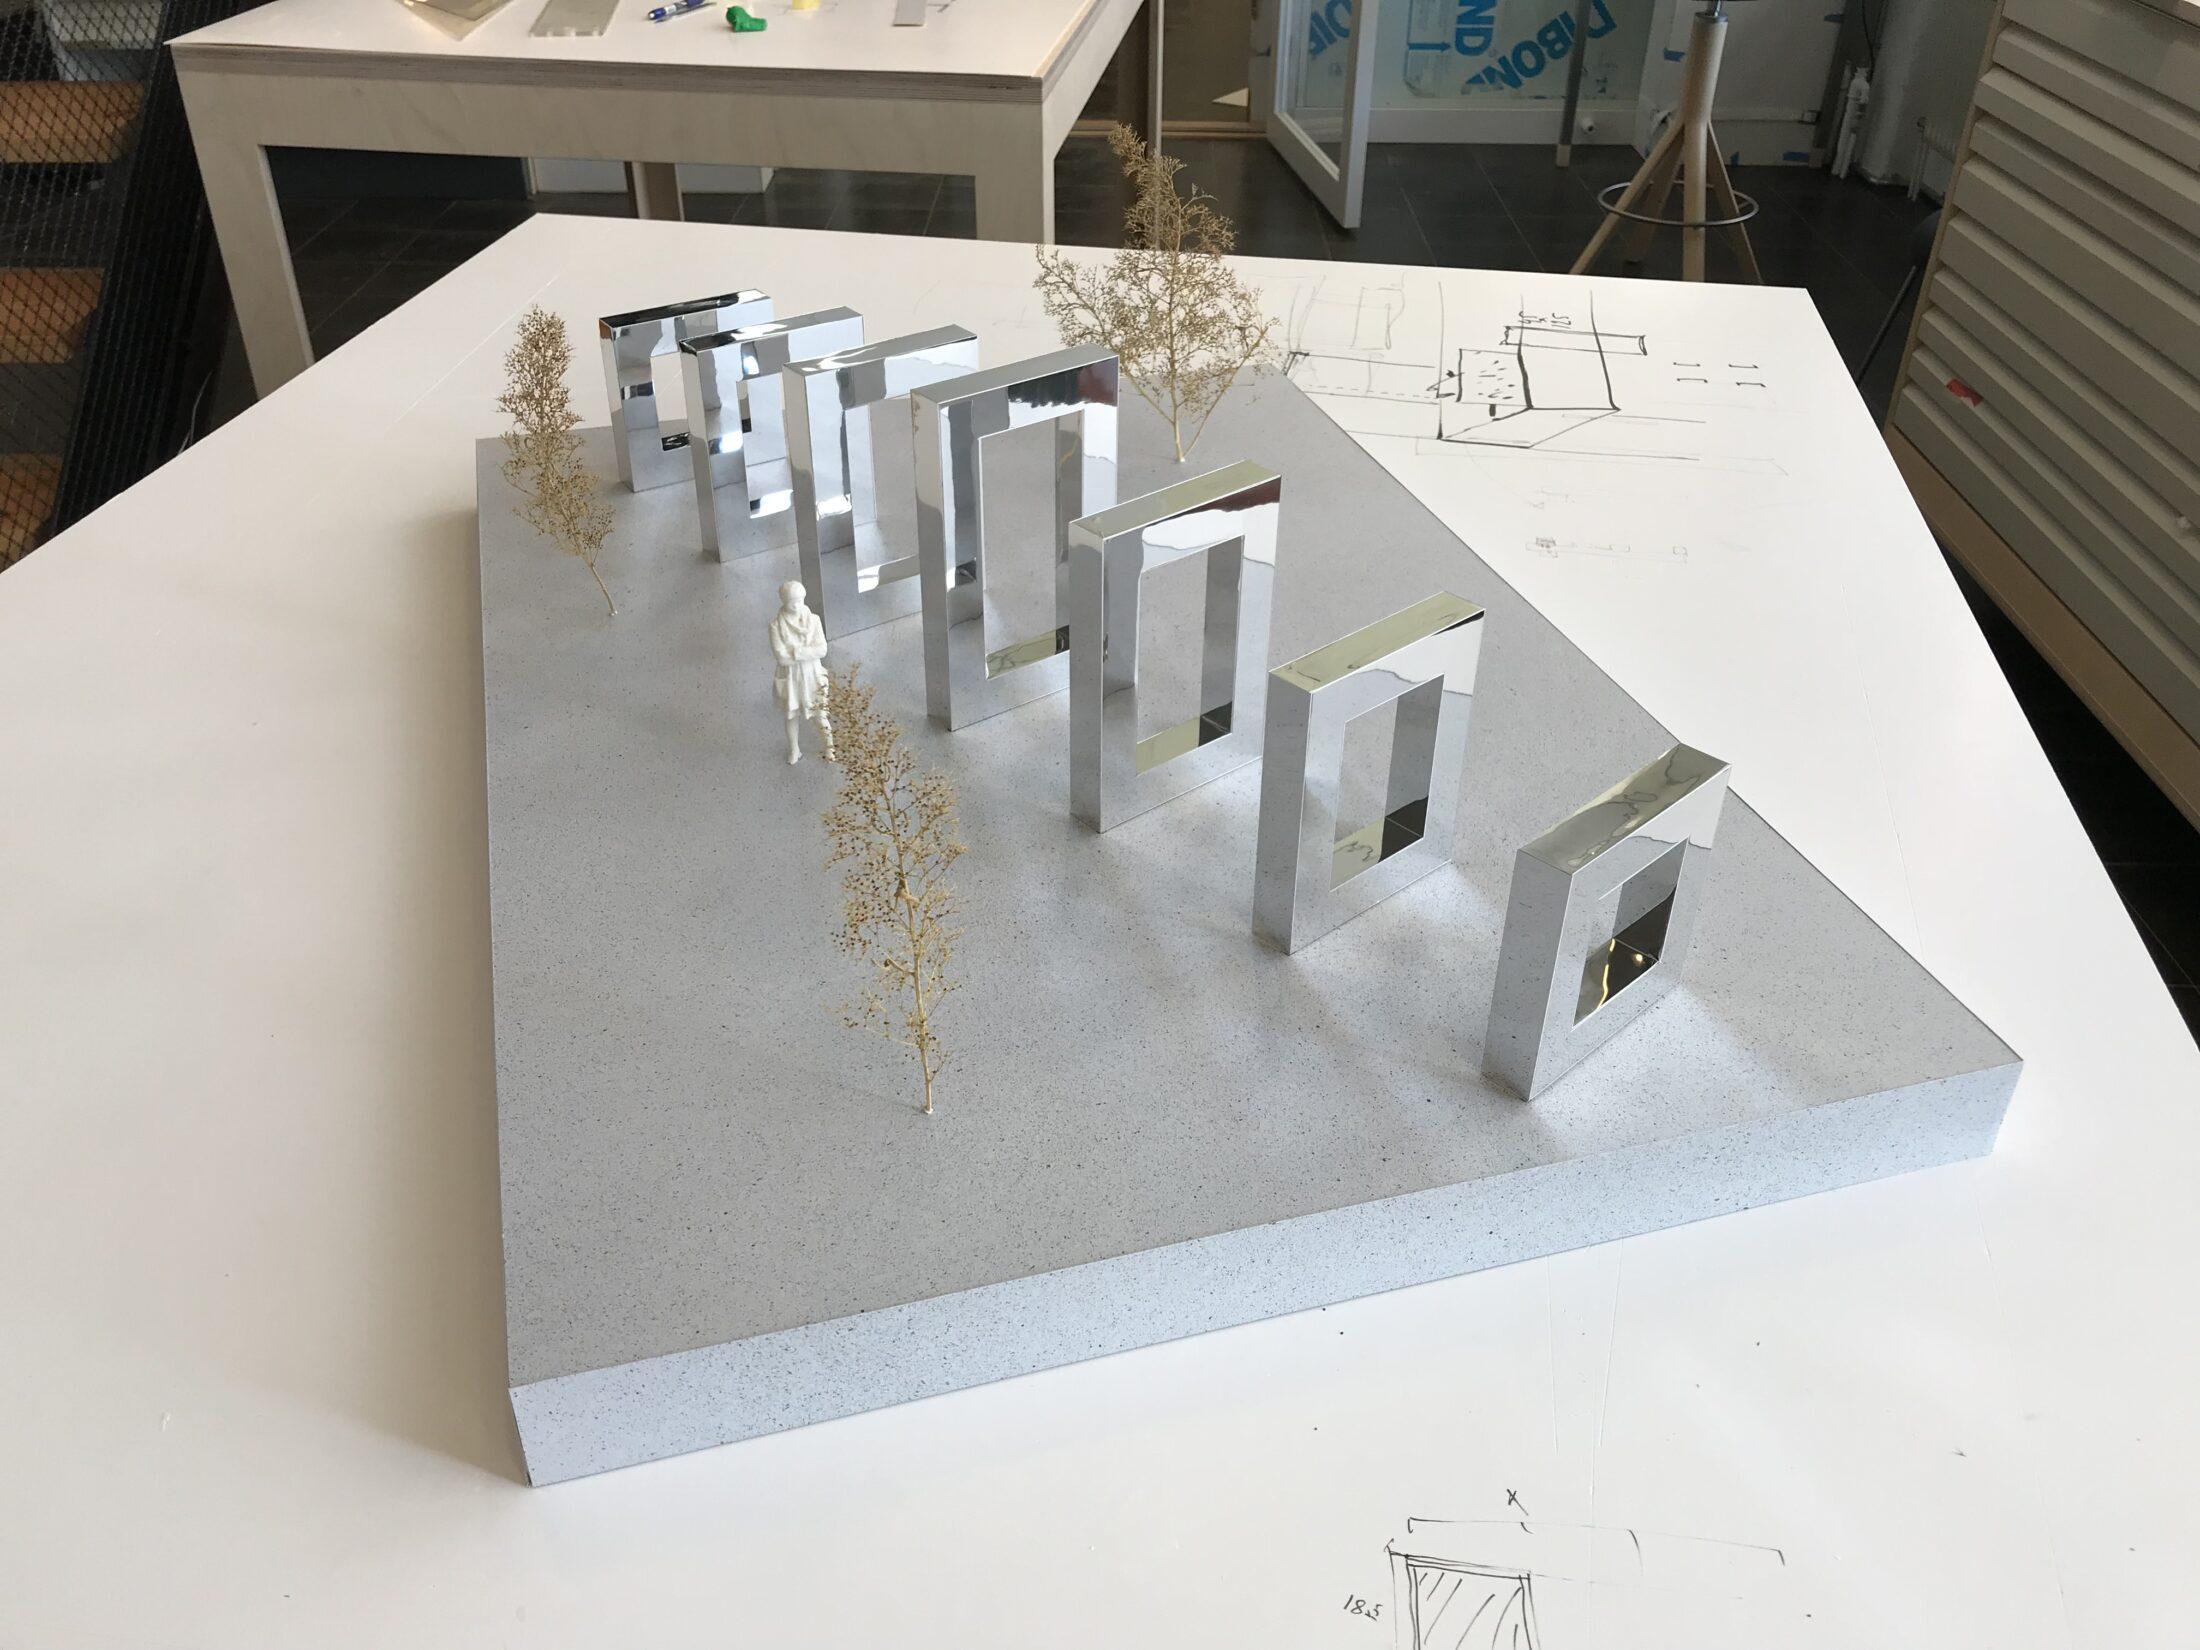 Fysisk modell, spegelramar, Nyréns modellverkstad